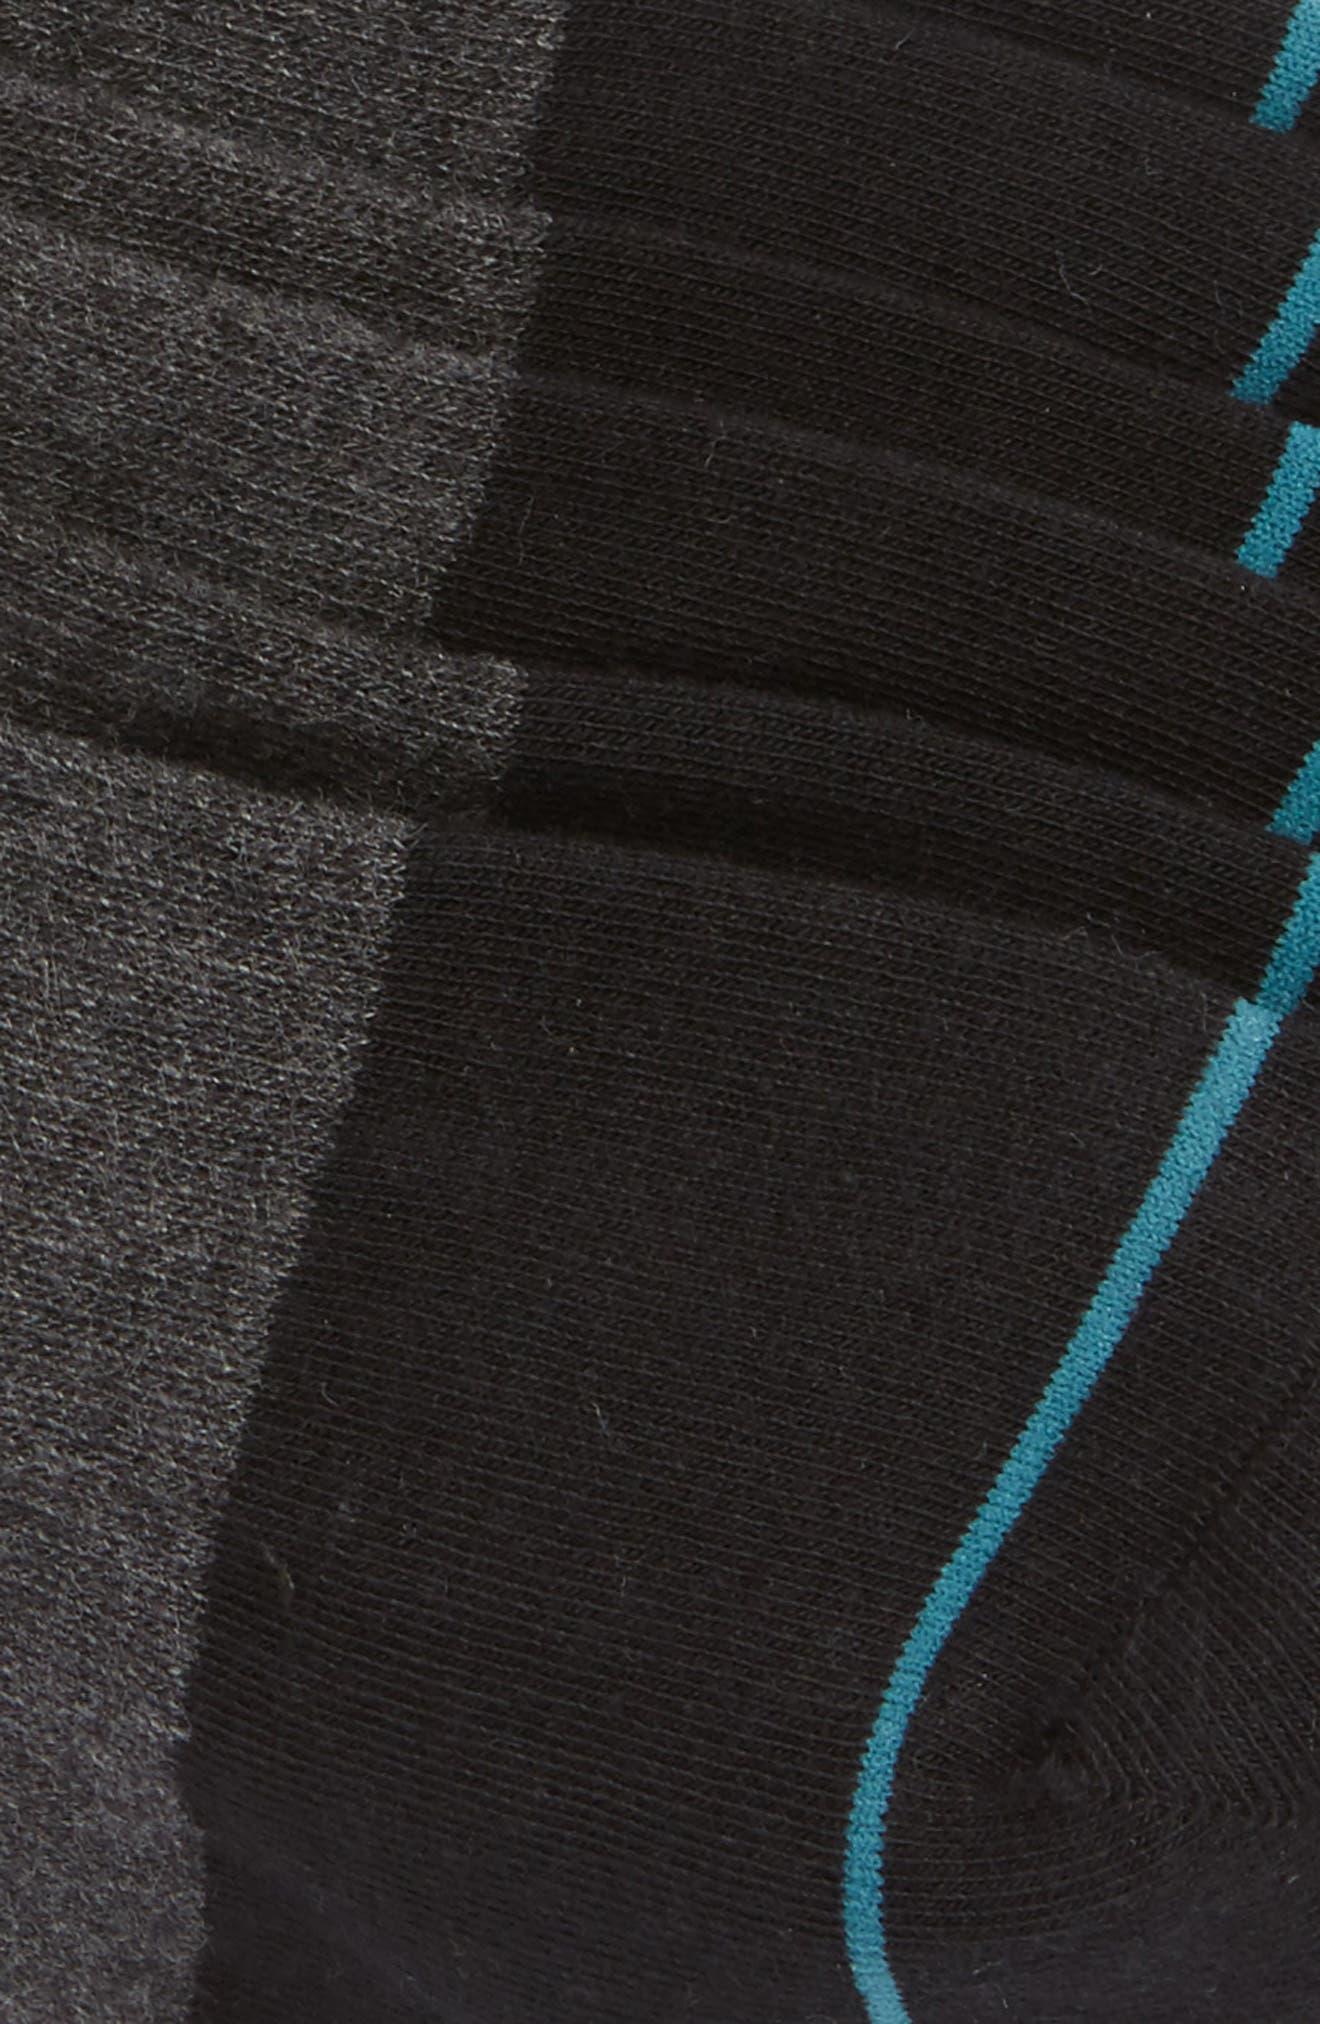 STANCE, Gamut 3-Pack No-Show Liner Socks, Alternate thumbnail 2, color, BLACK